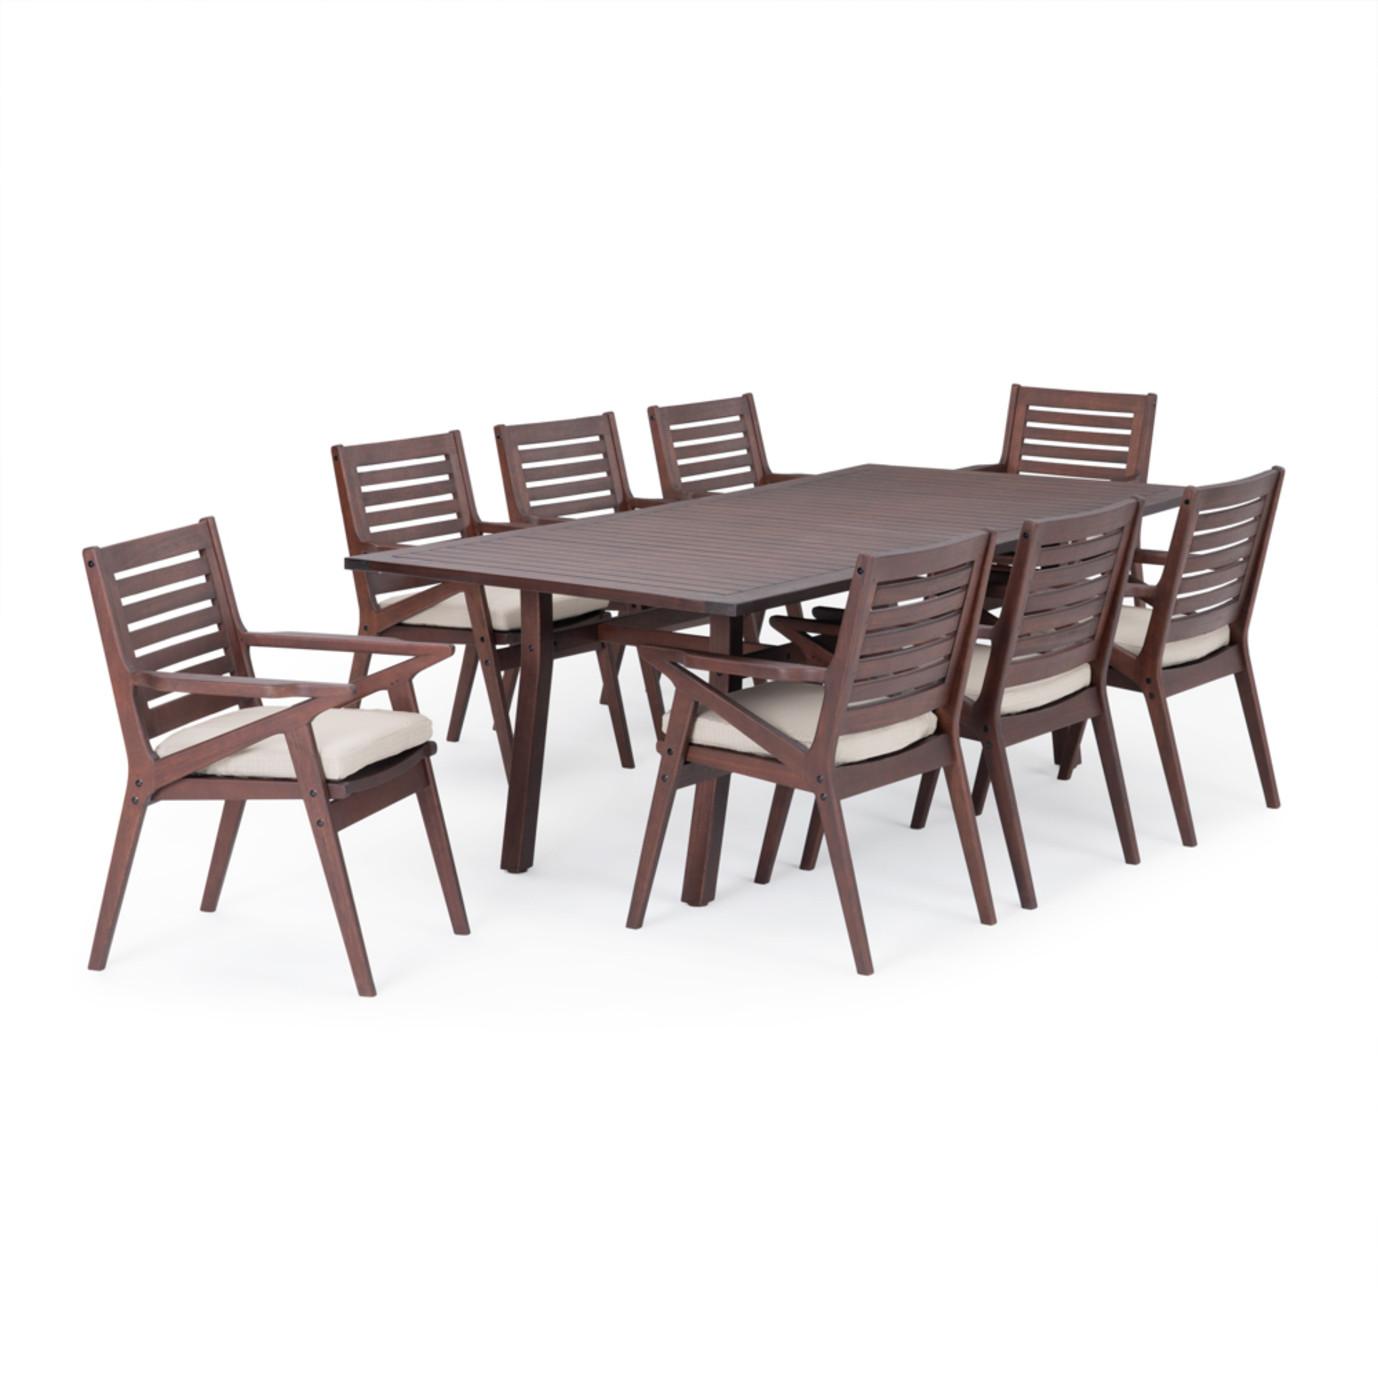 Vaughn™ 9 Piece Dining Set - Slate Gray